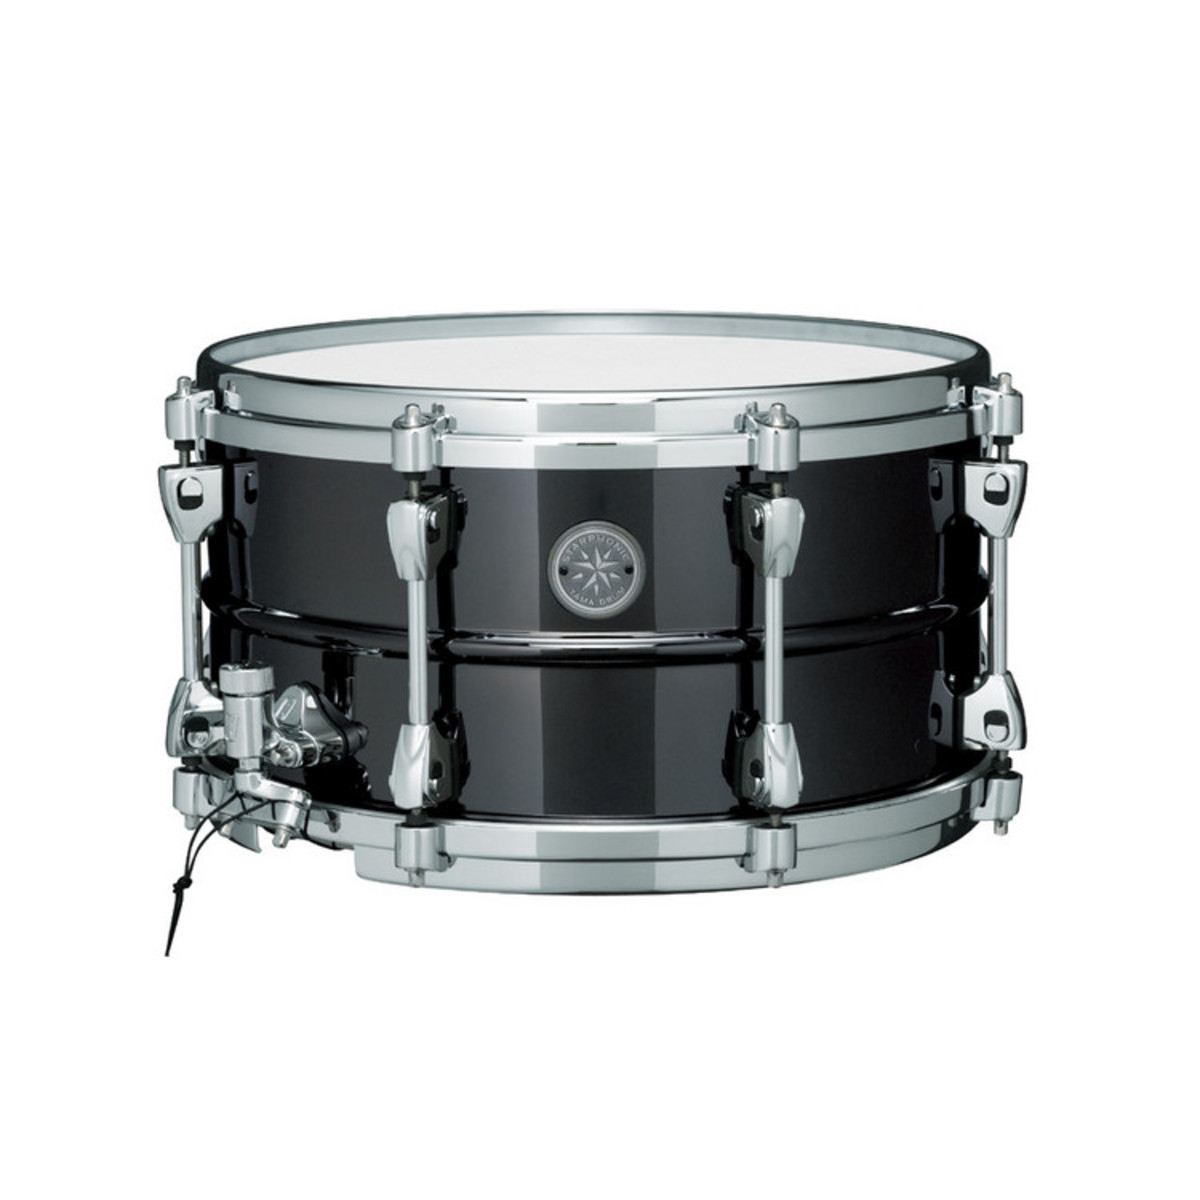 Tama STARPHONIC 13\'\' x 7\'\' PST137 Snare Drum, Steel bei Gear4music